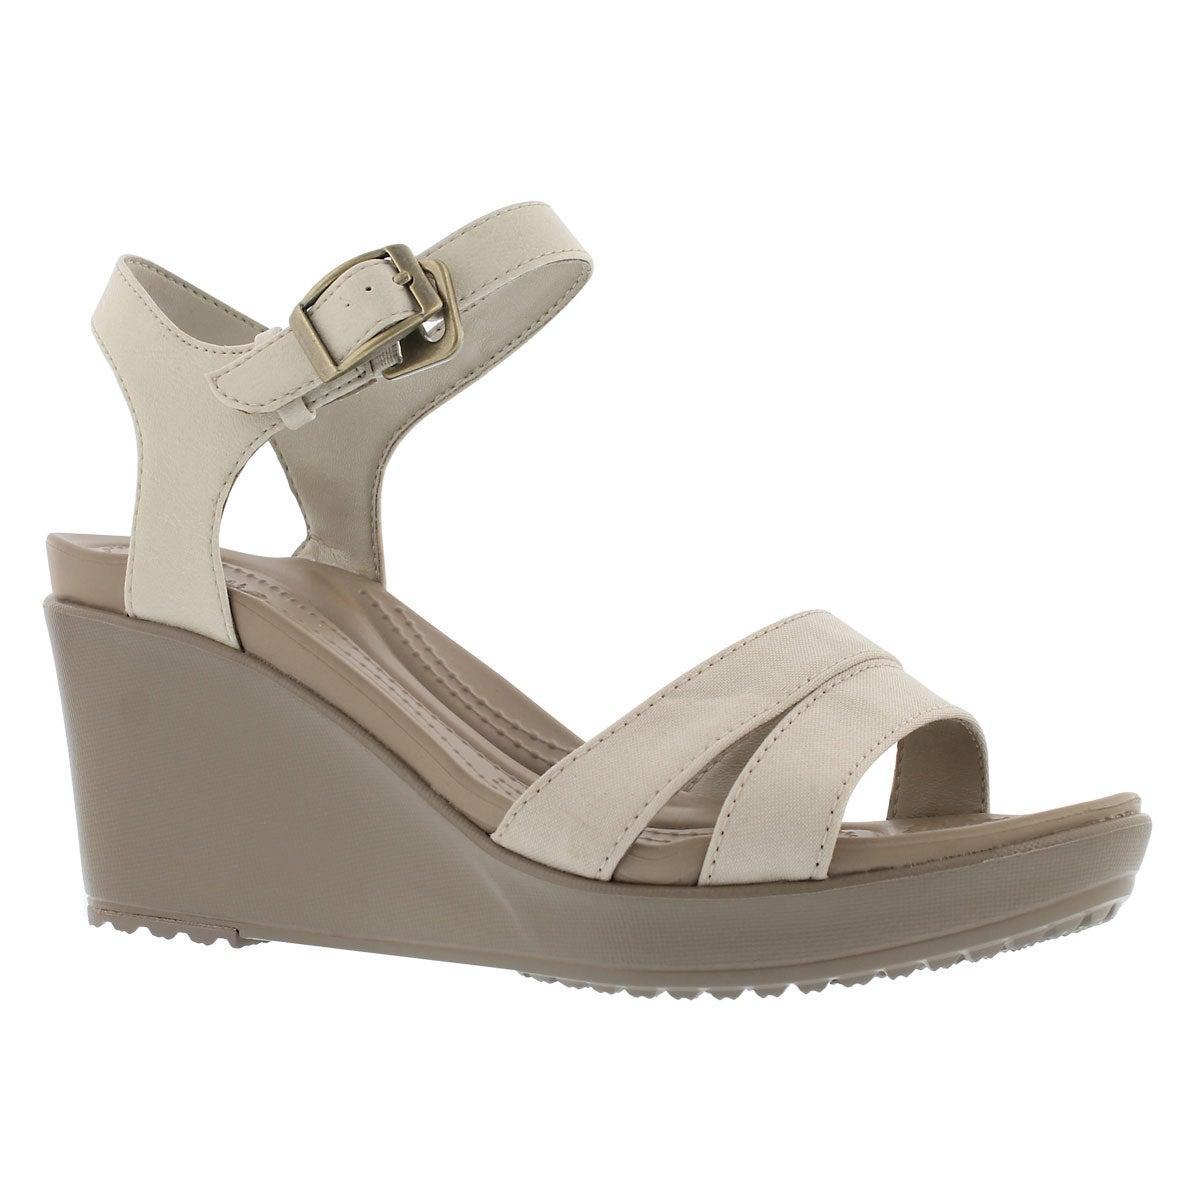 Crocs Leigh II Ankle Strap Wedge Sandal (Women's) QBDKh